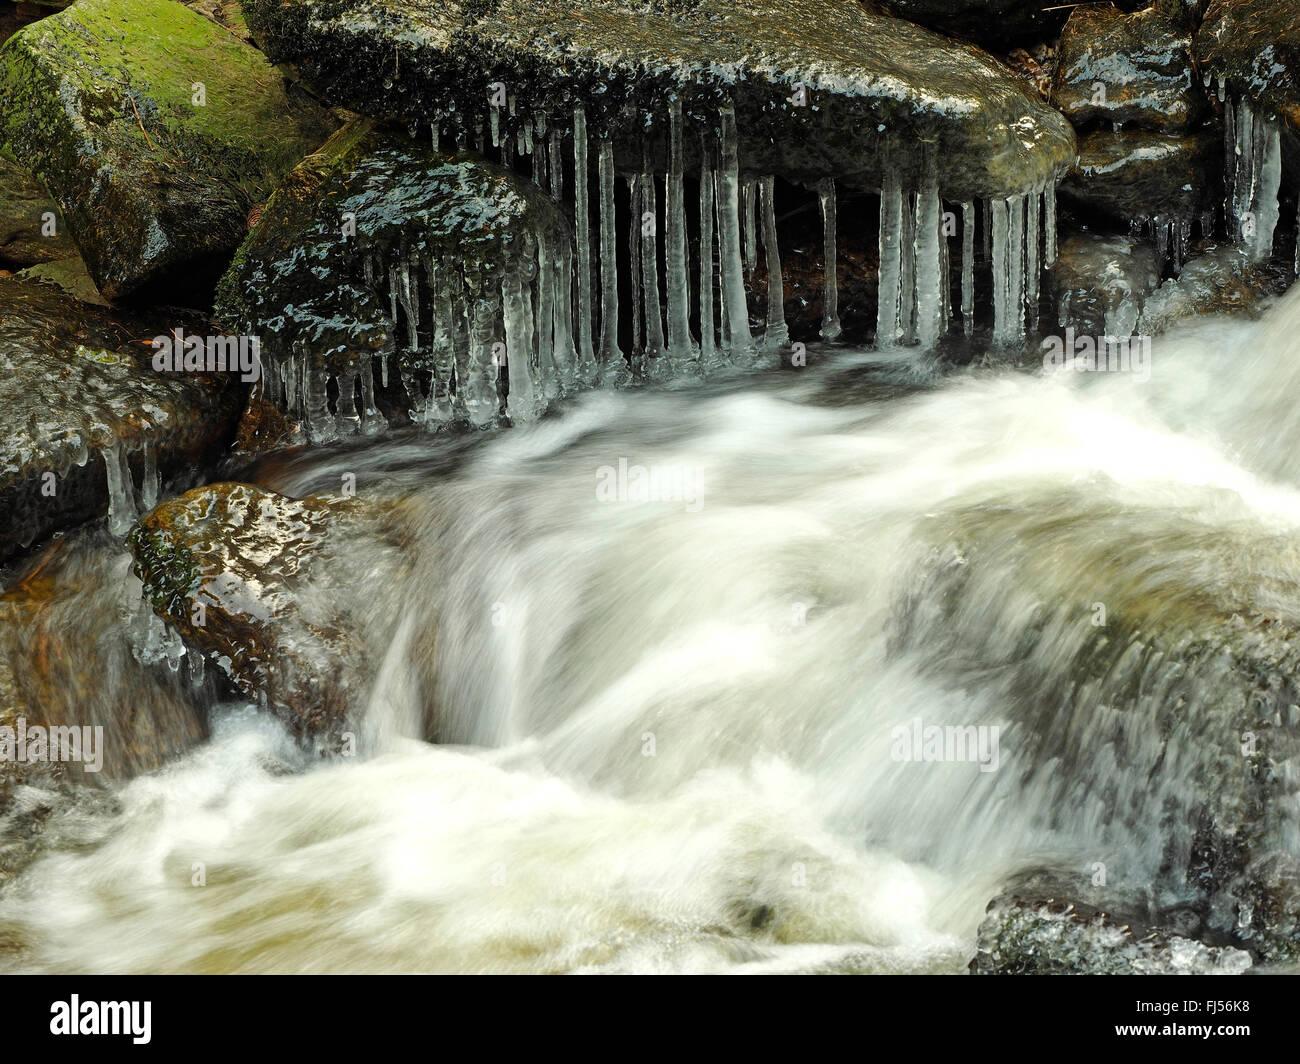 running water in rocky creek freezing up, Germany, Saxony, Erz Mountains, Schwarzwassertal - Stock Image